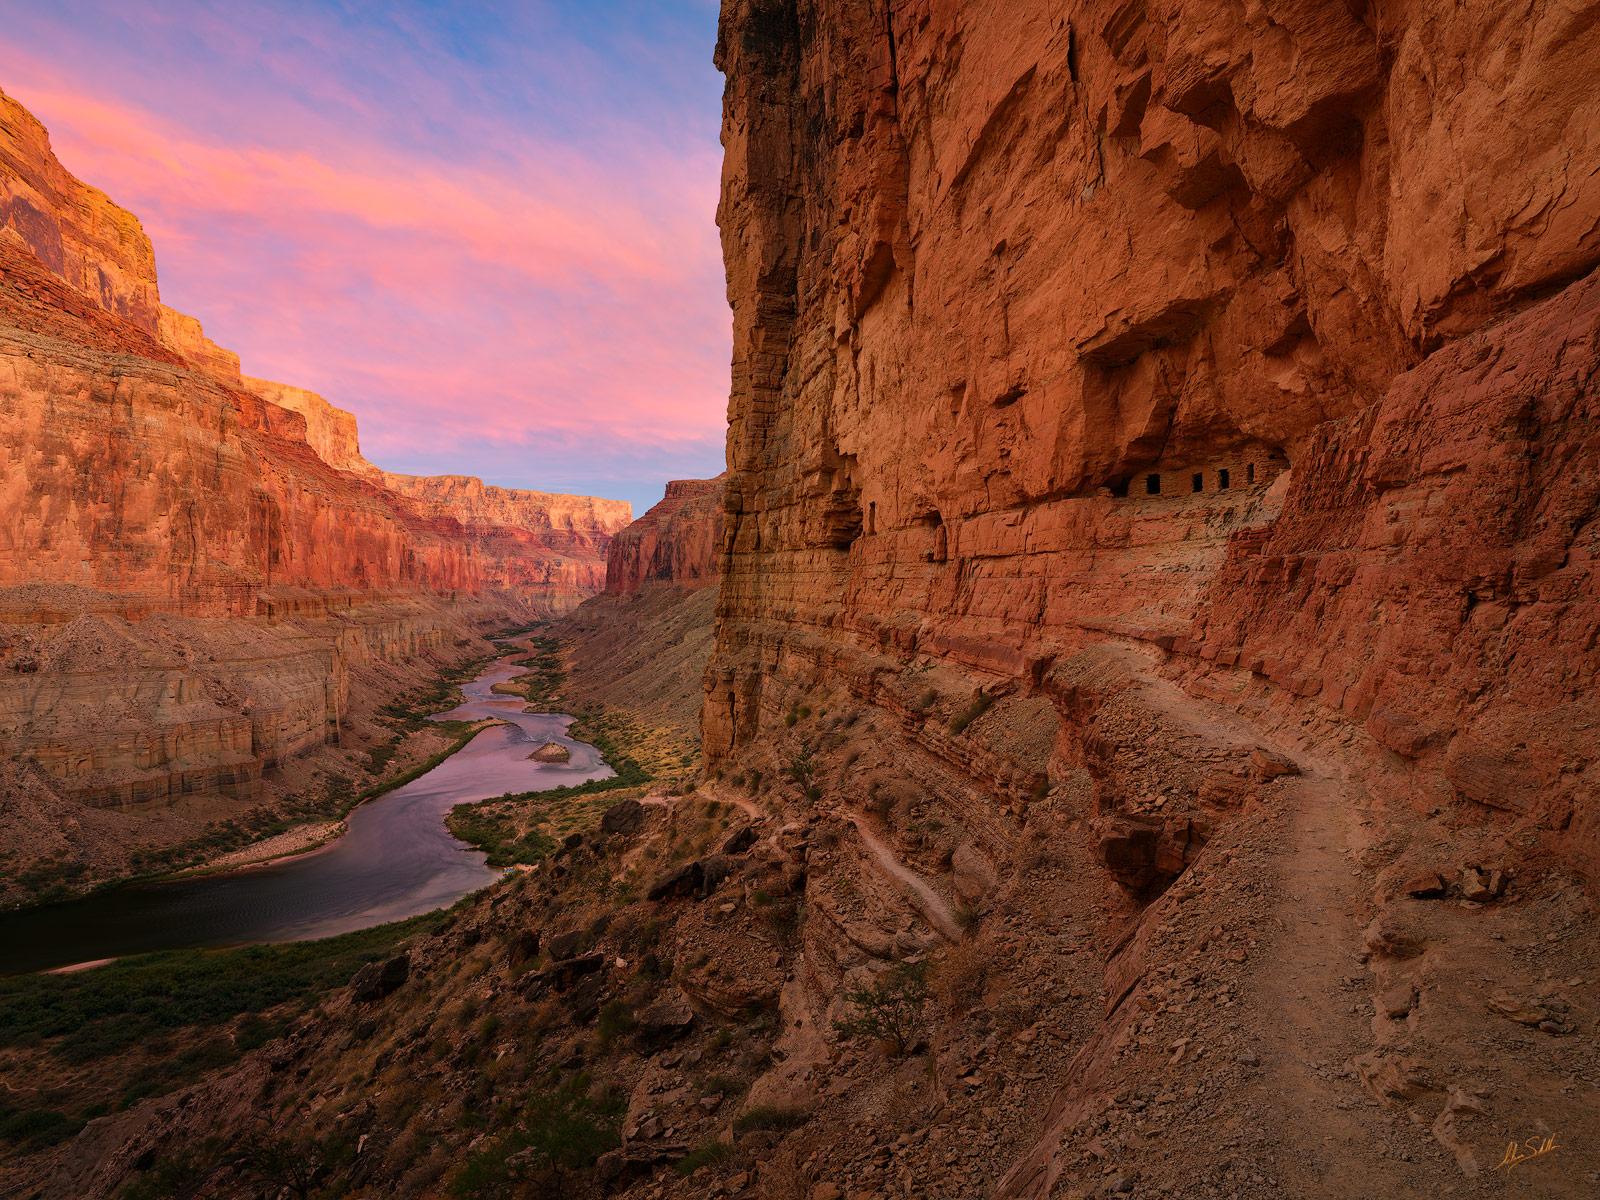 AZ, Archaeological, Archaeological Site, Archaeology, Arizona, Below the Rim, Colorado River, Expedition, FujiFilm, GFX, GFX 100, Granaries, Grand Canyon, Indian, Marble Canyon, Nankoweap, National Pa, photo